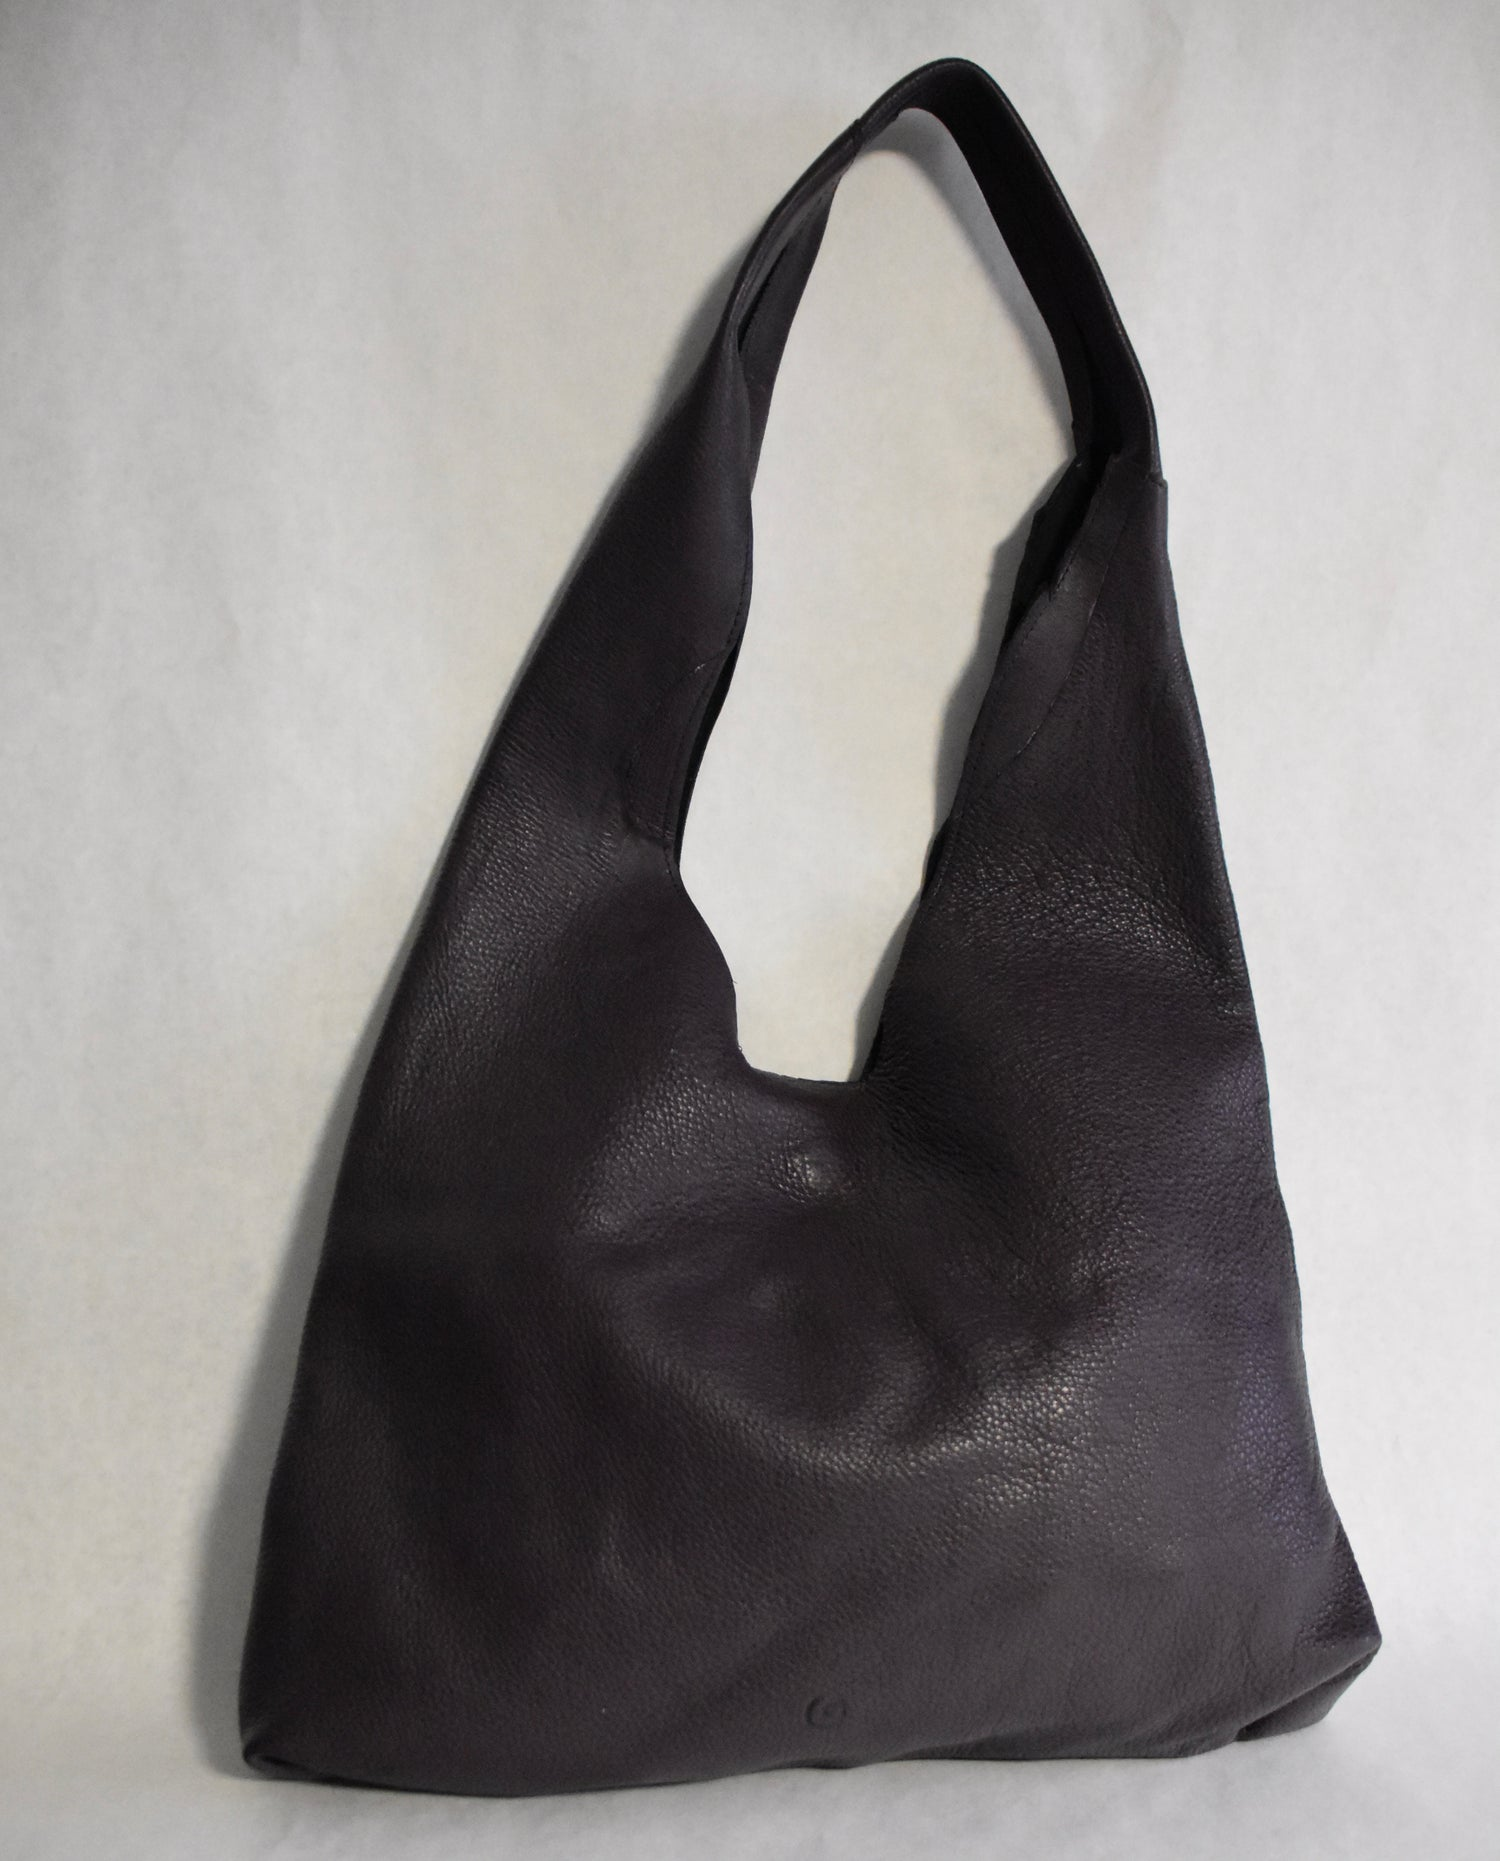 Image of poney bag # 93